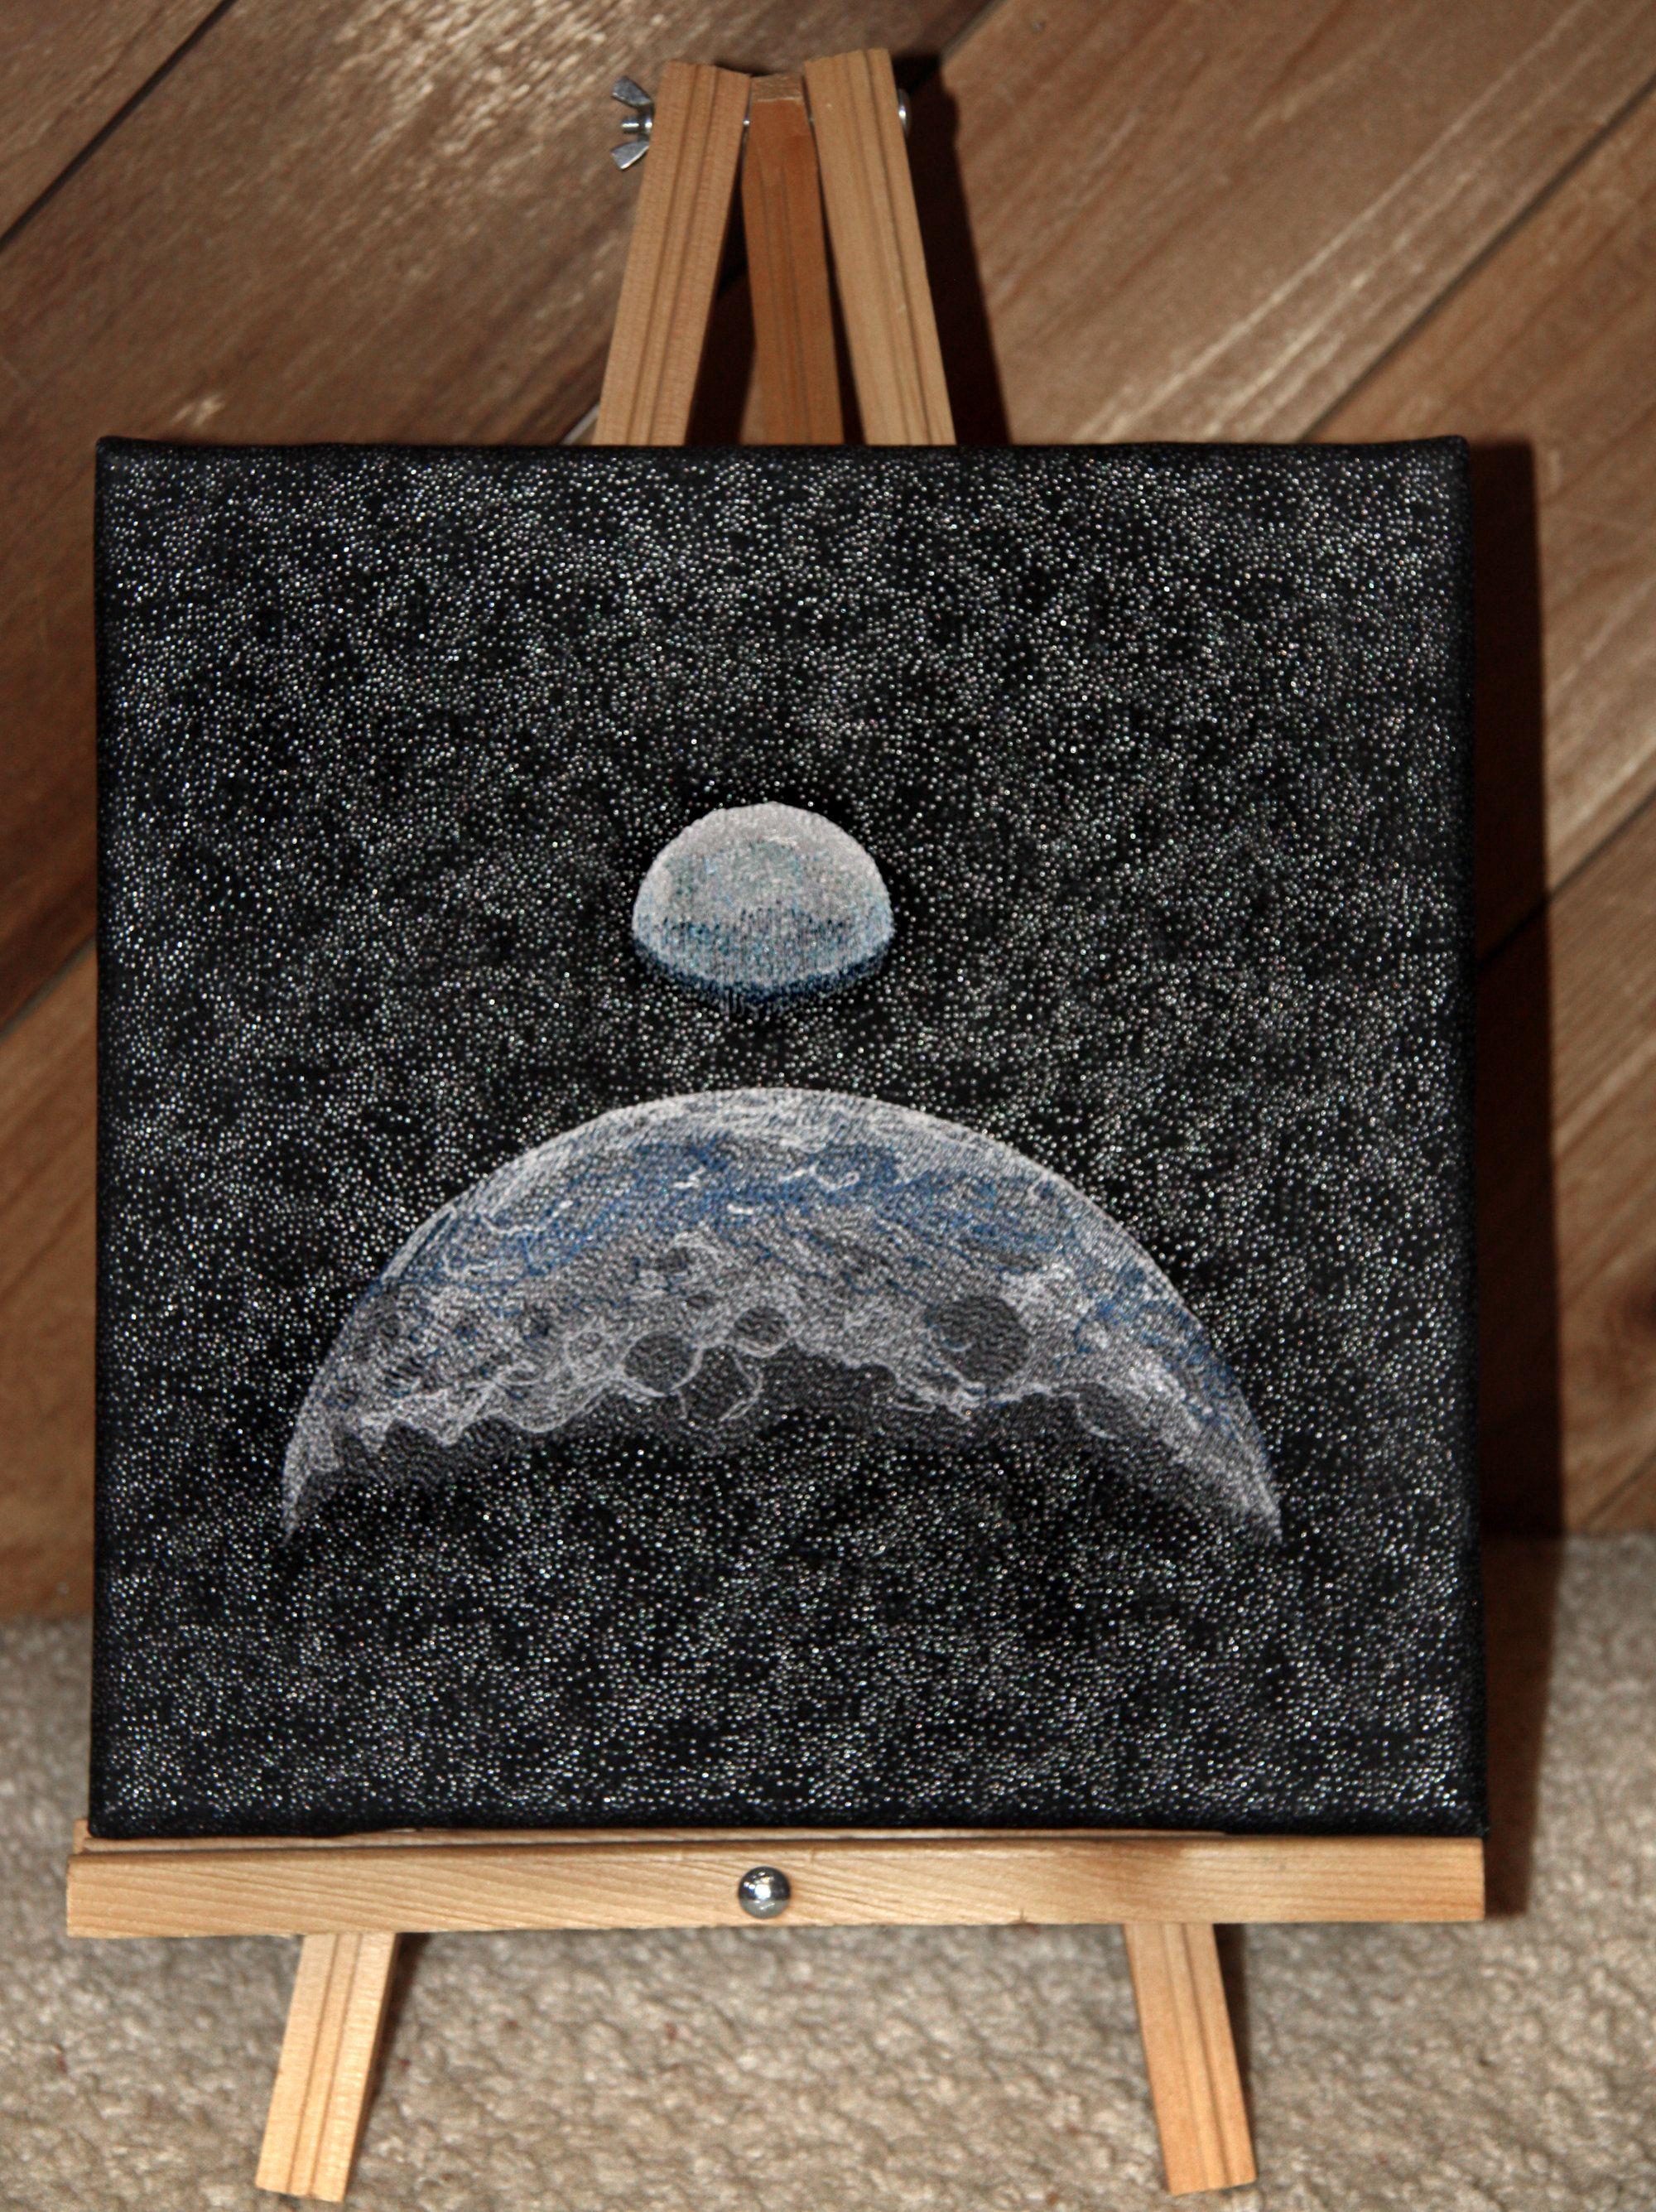 Lunar Landing 50Th Anniversary Handmade Embroidered Wall Art throughout Landing Art Wall Decor (Image 16 of 30)